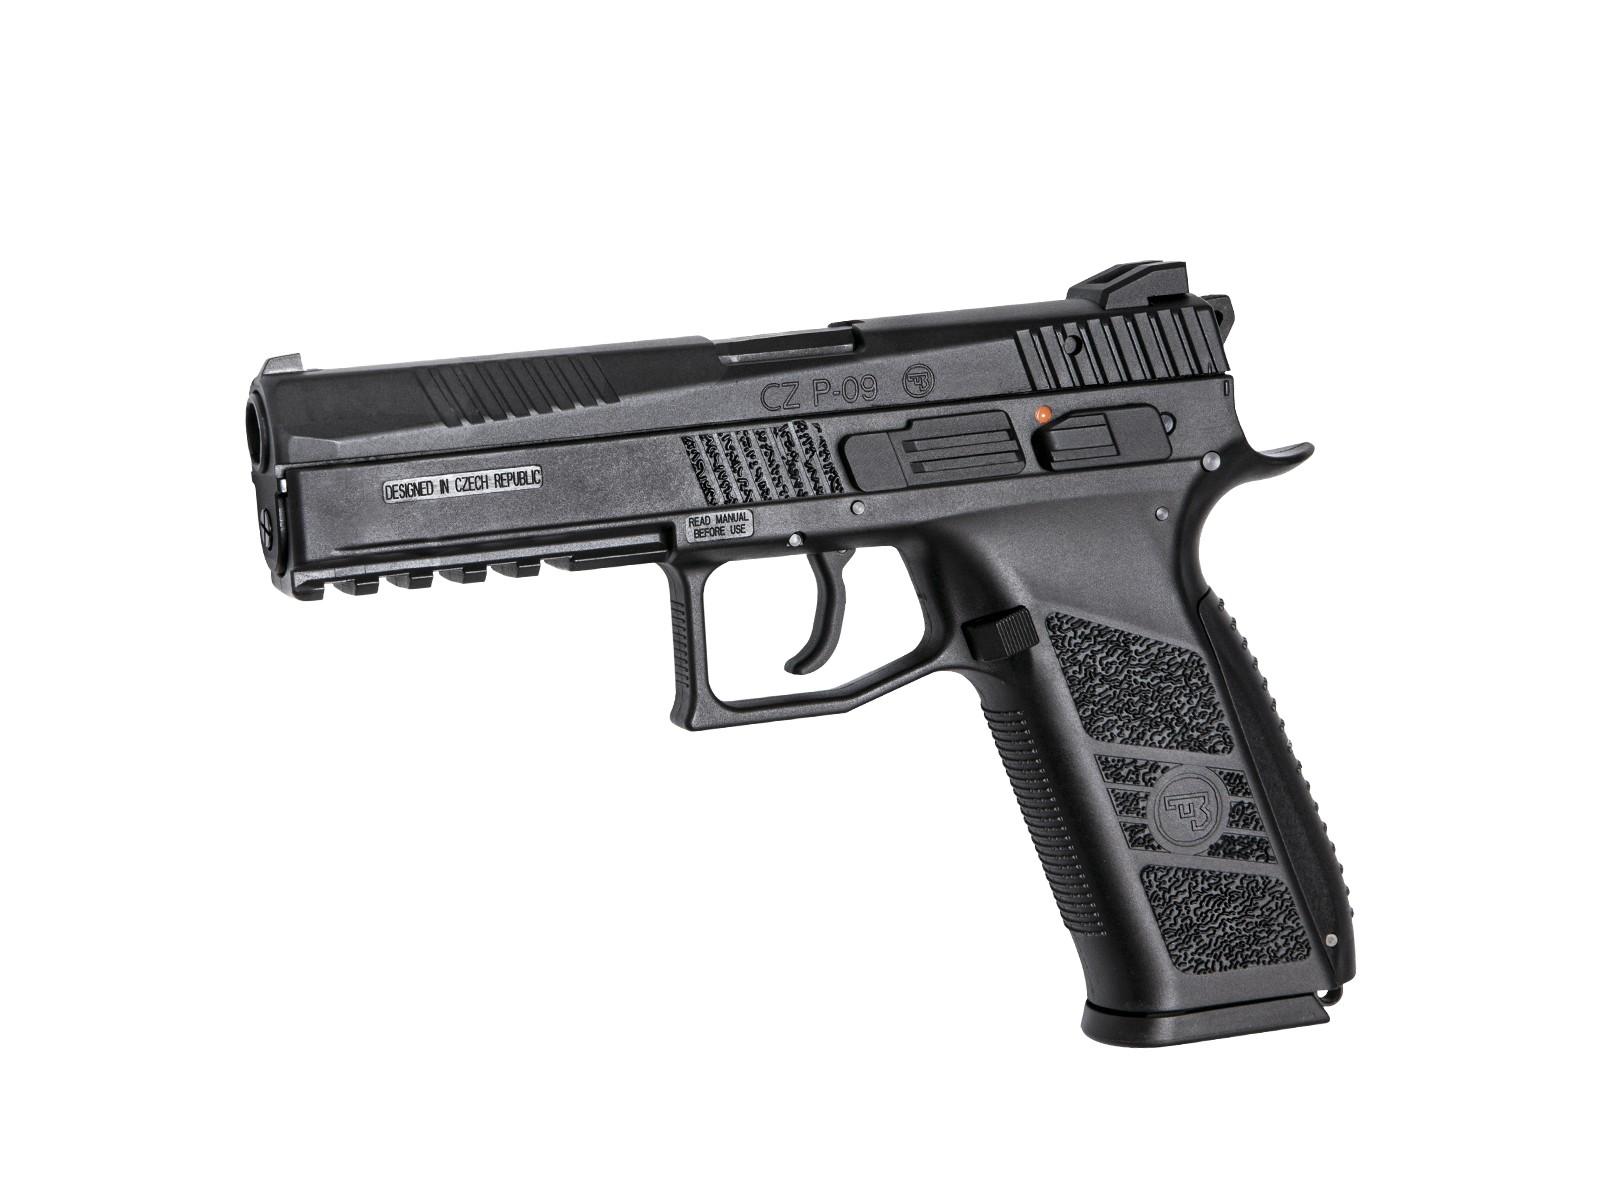 ASG CZ P-09 GBB Pistol (Black)